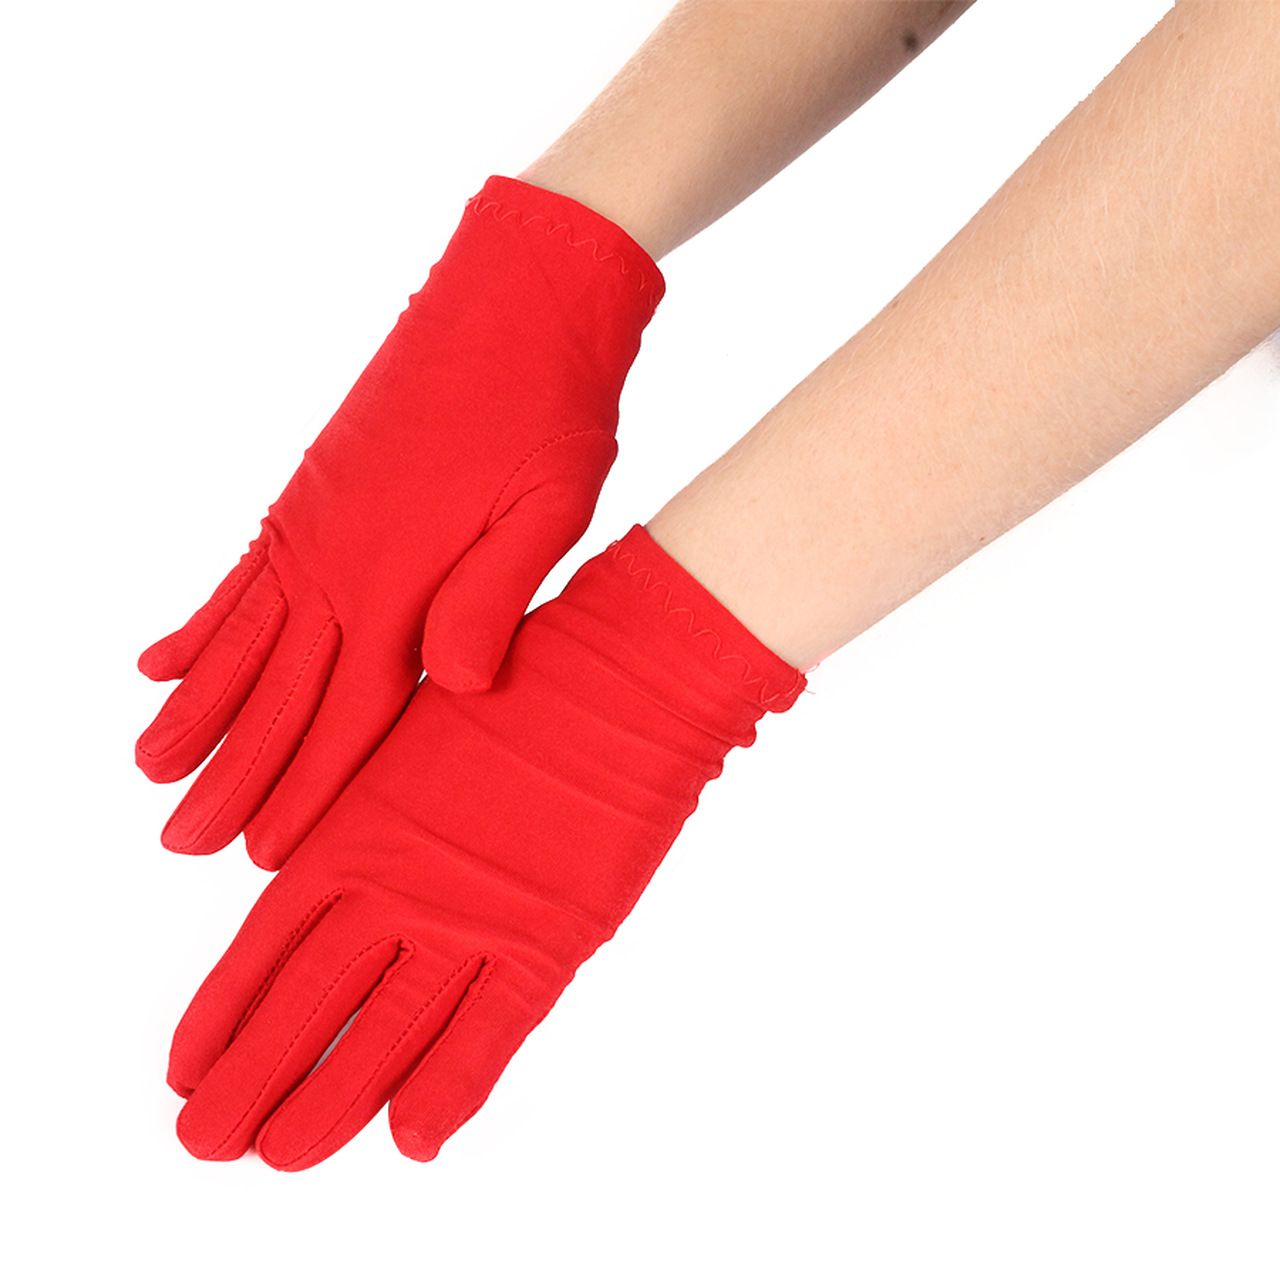 Luva Curta - Preta / Vermelha / Branca